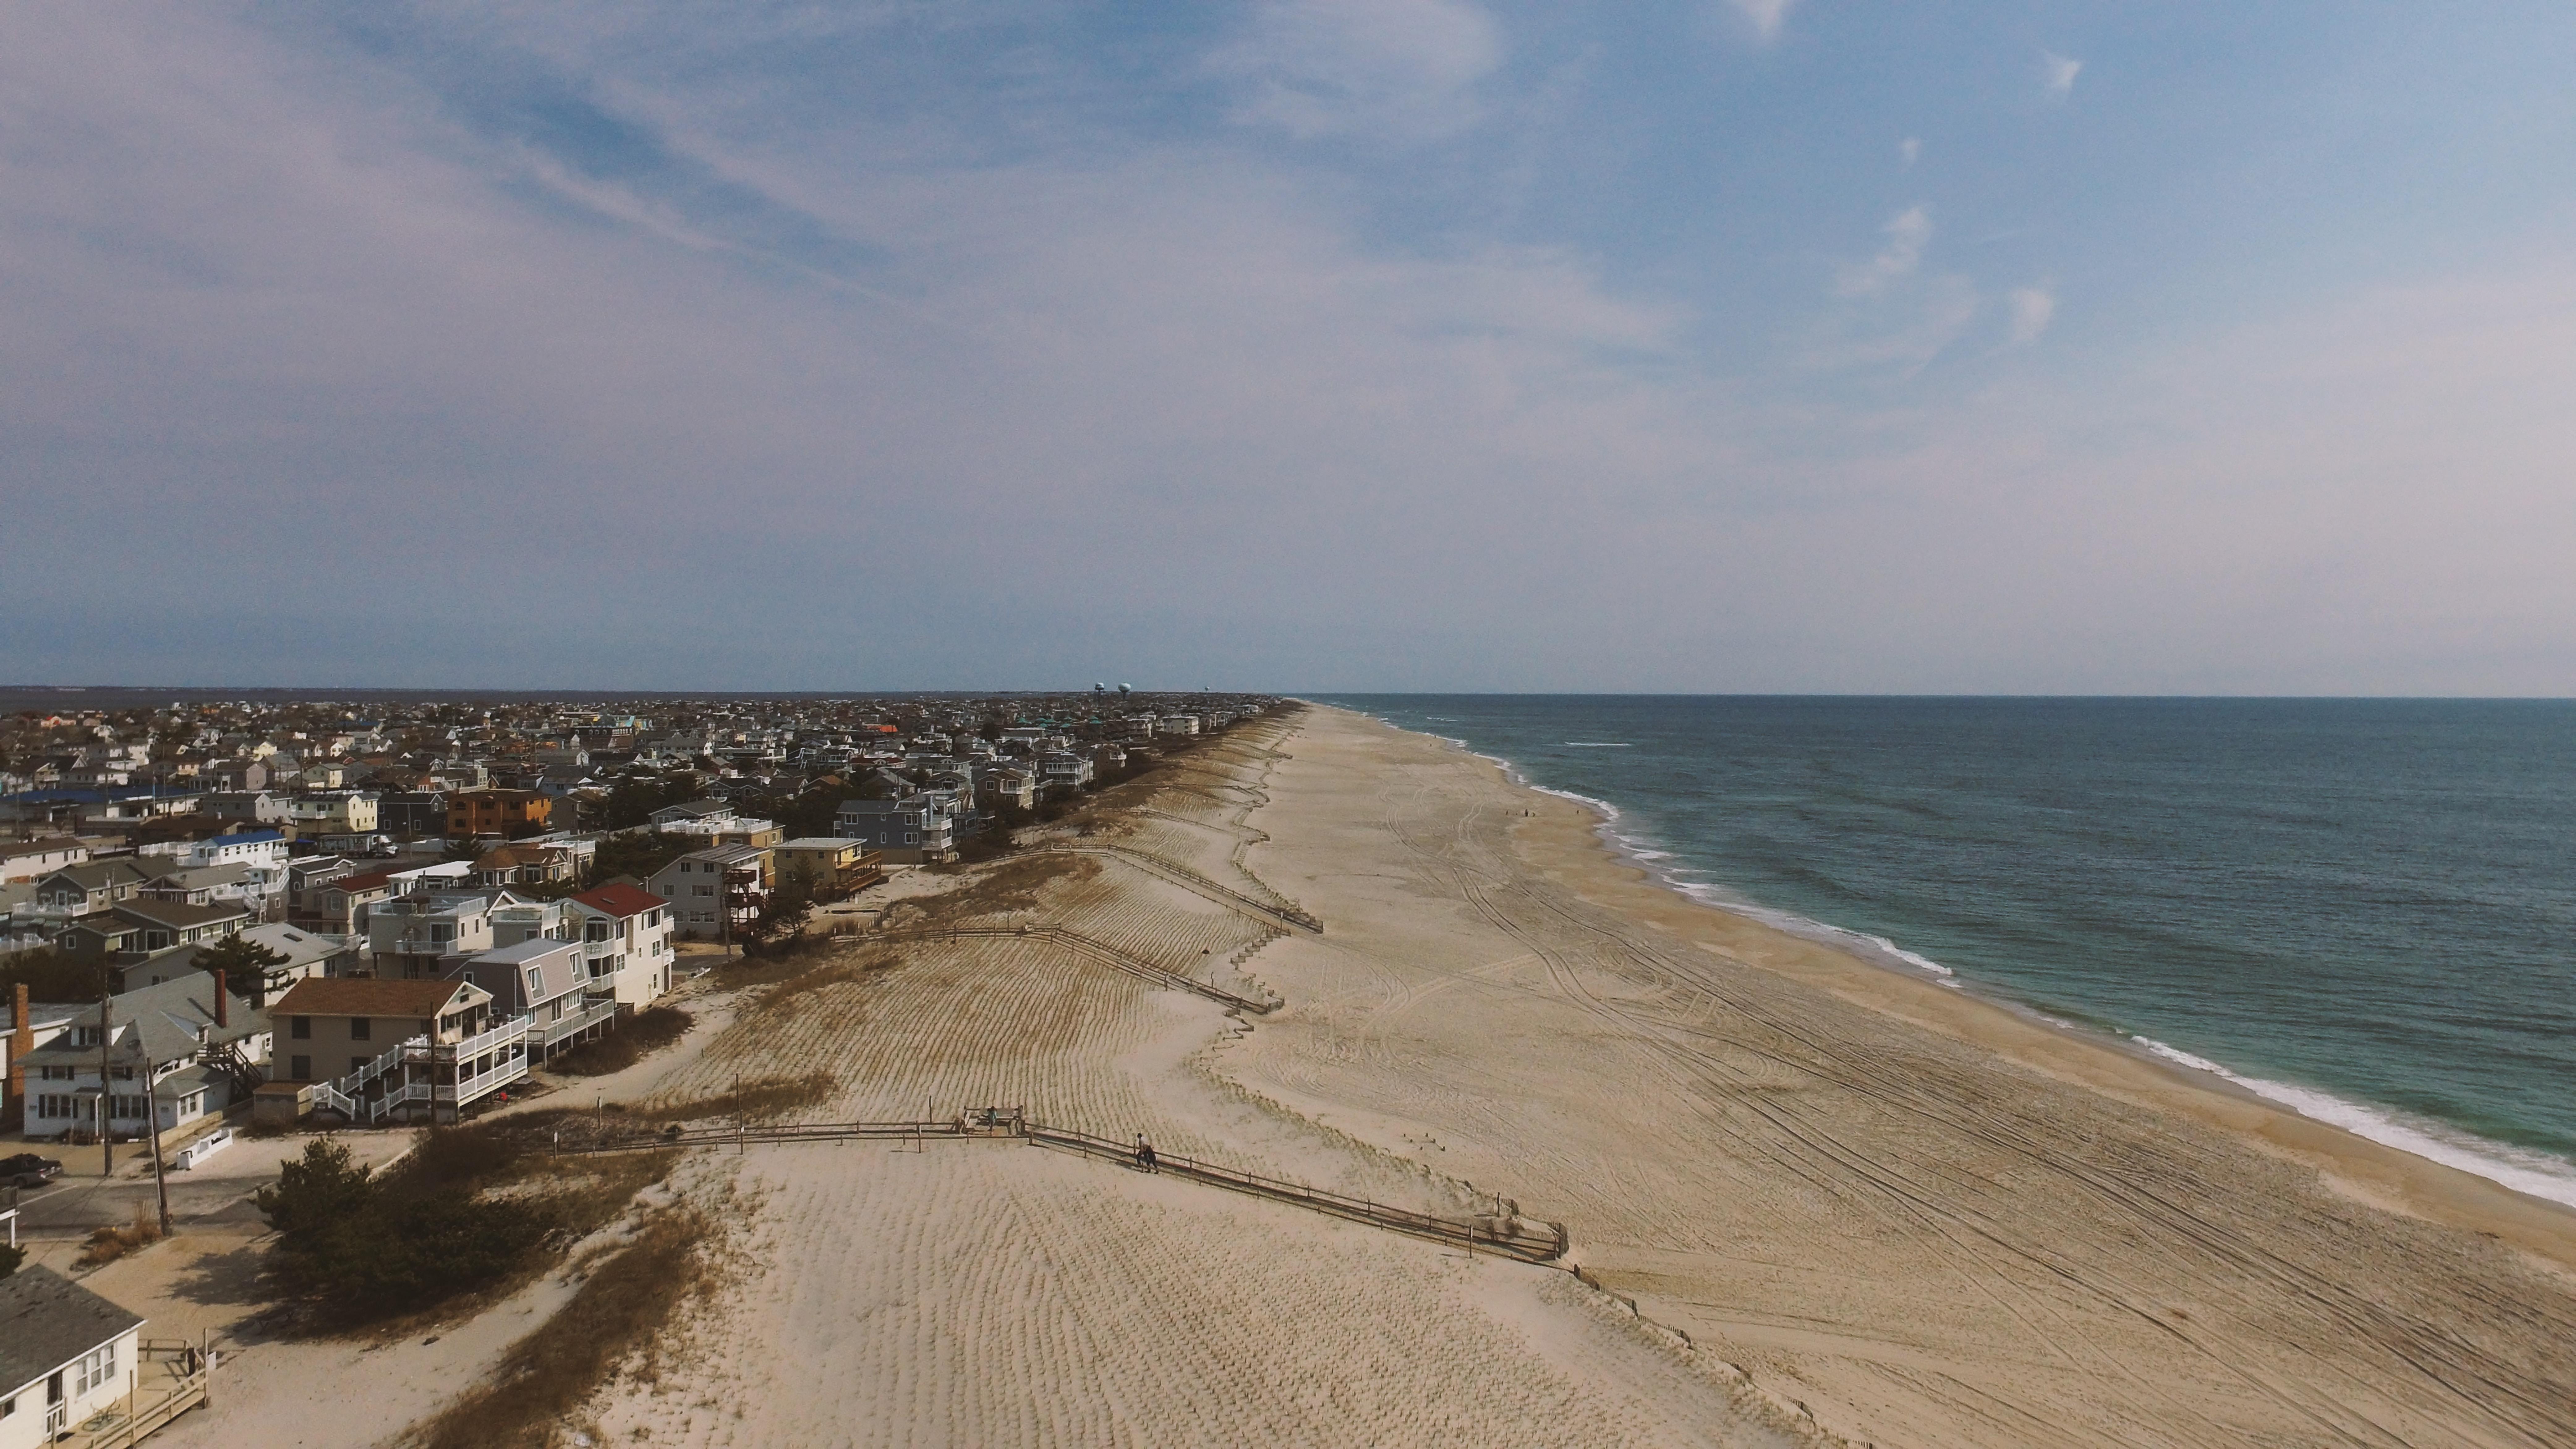 Coastline town on an ocean sand shore